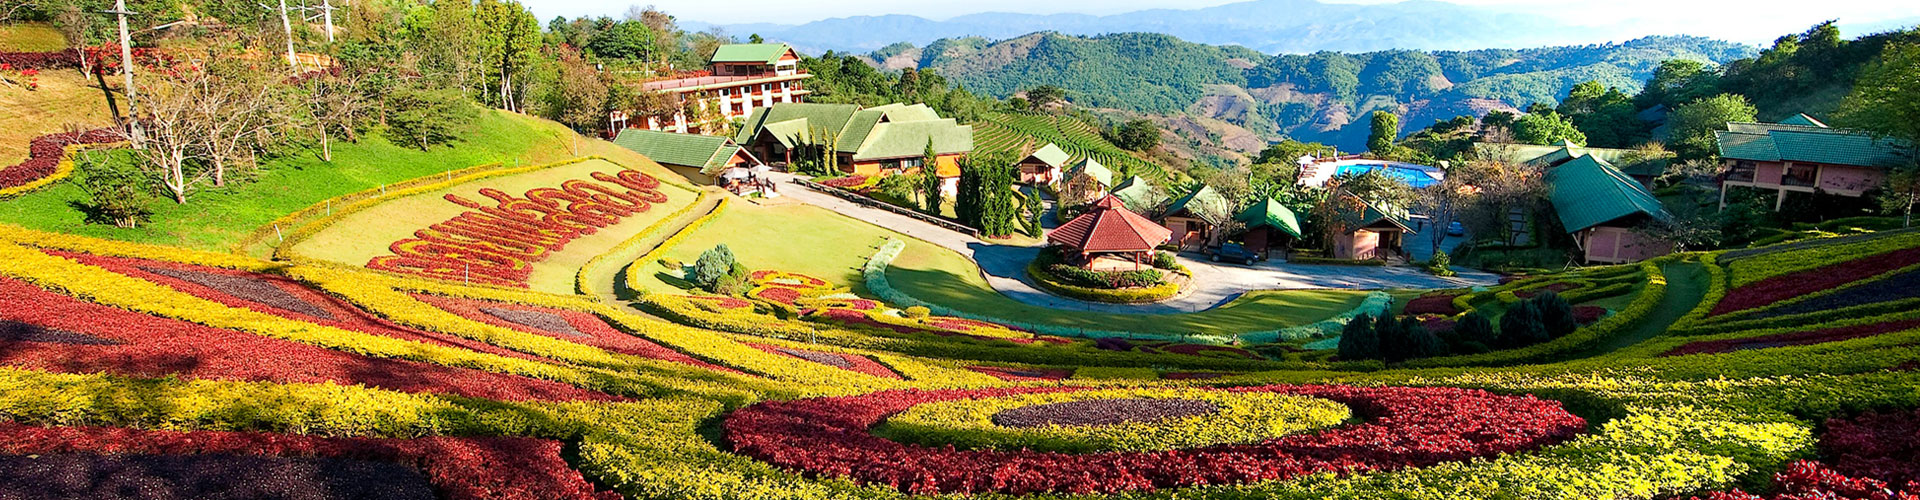 Chiangmai, Chiangrai, Ratchaburi, Khao Kho